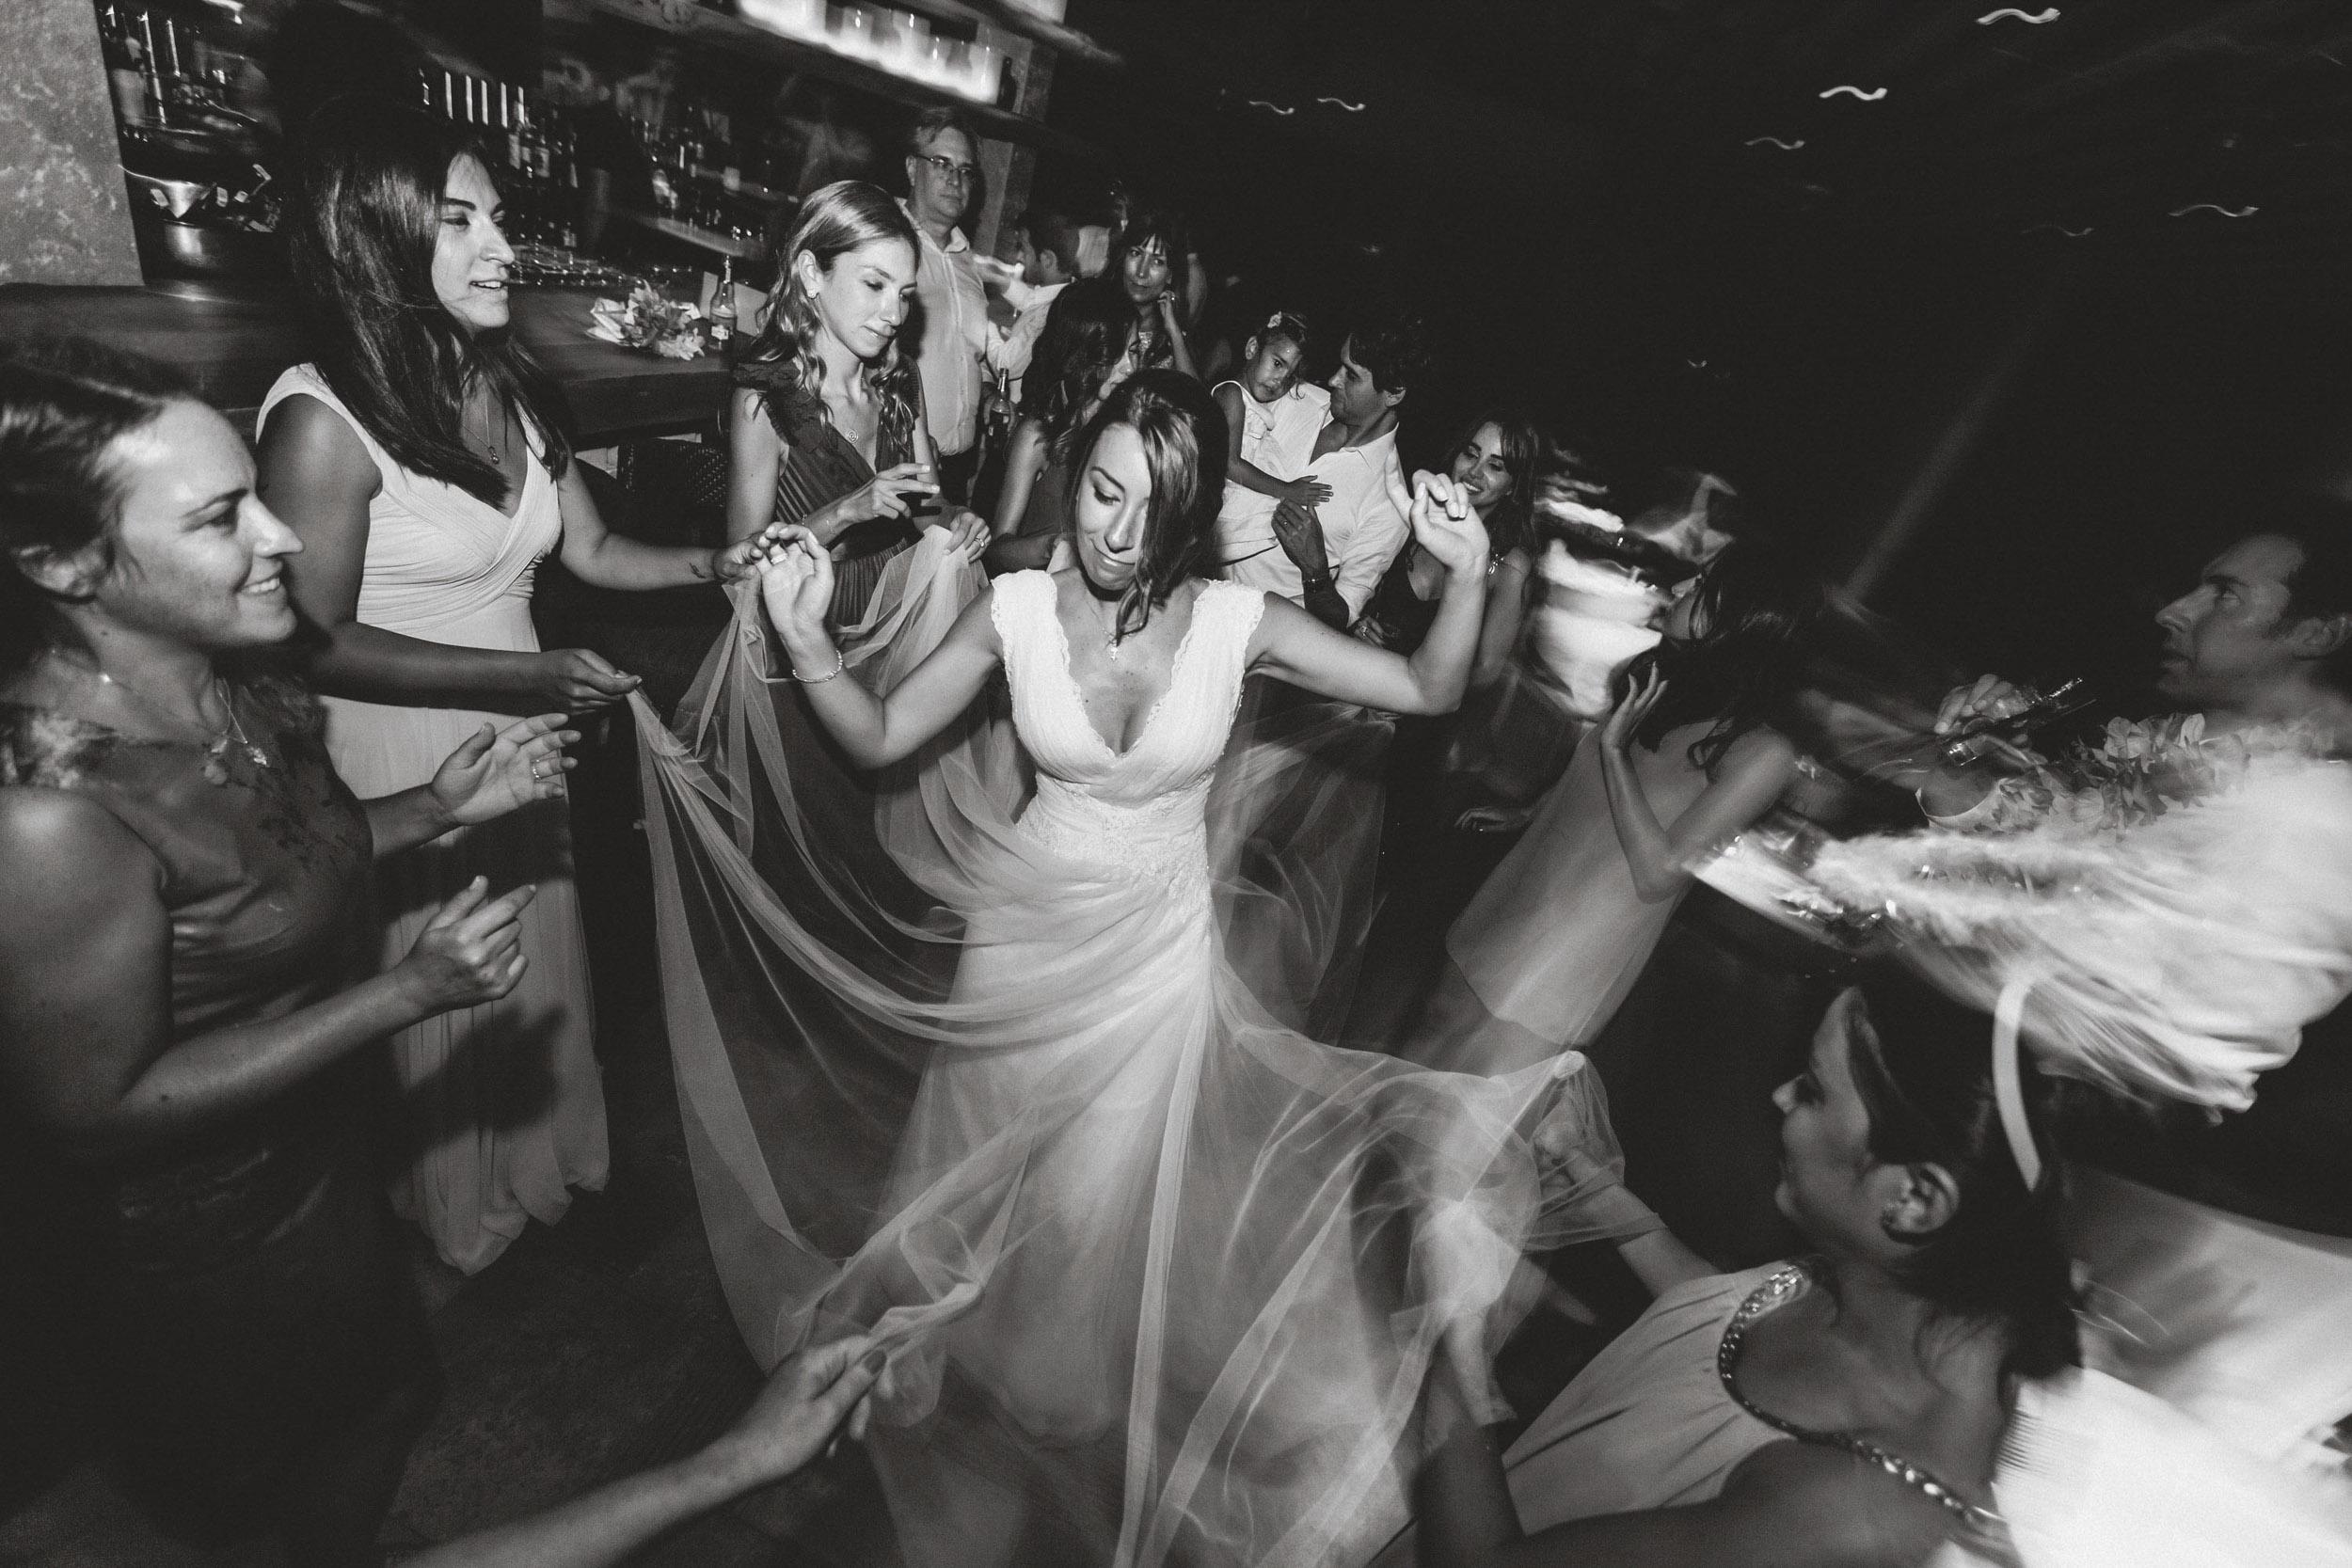 hochzeitsfotografie-schweiz_wedding-photographer-switzerland-europe_Bendik-Photography-131